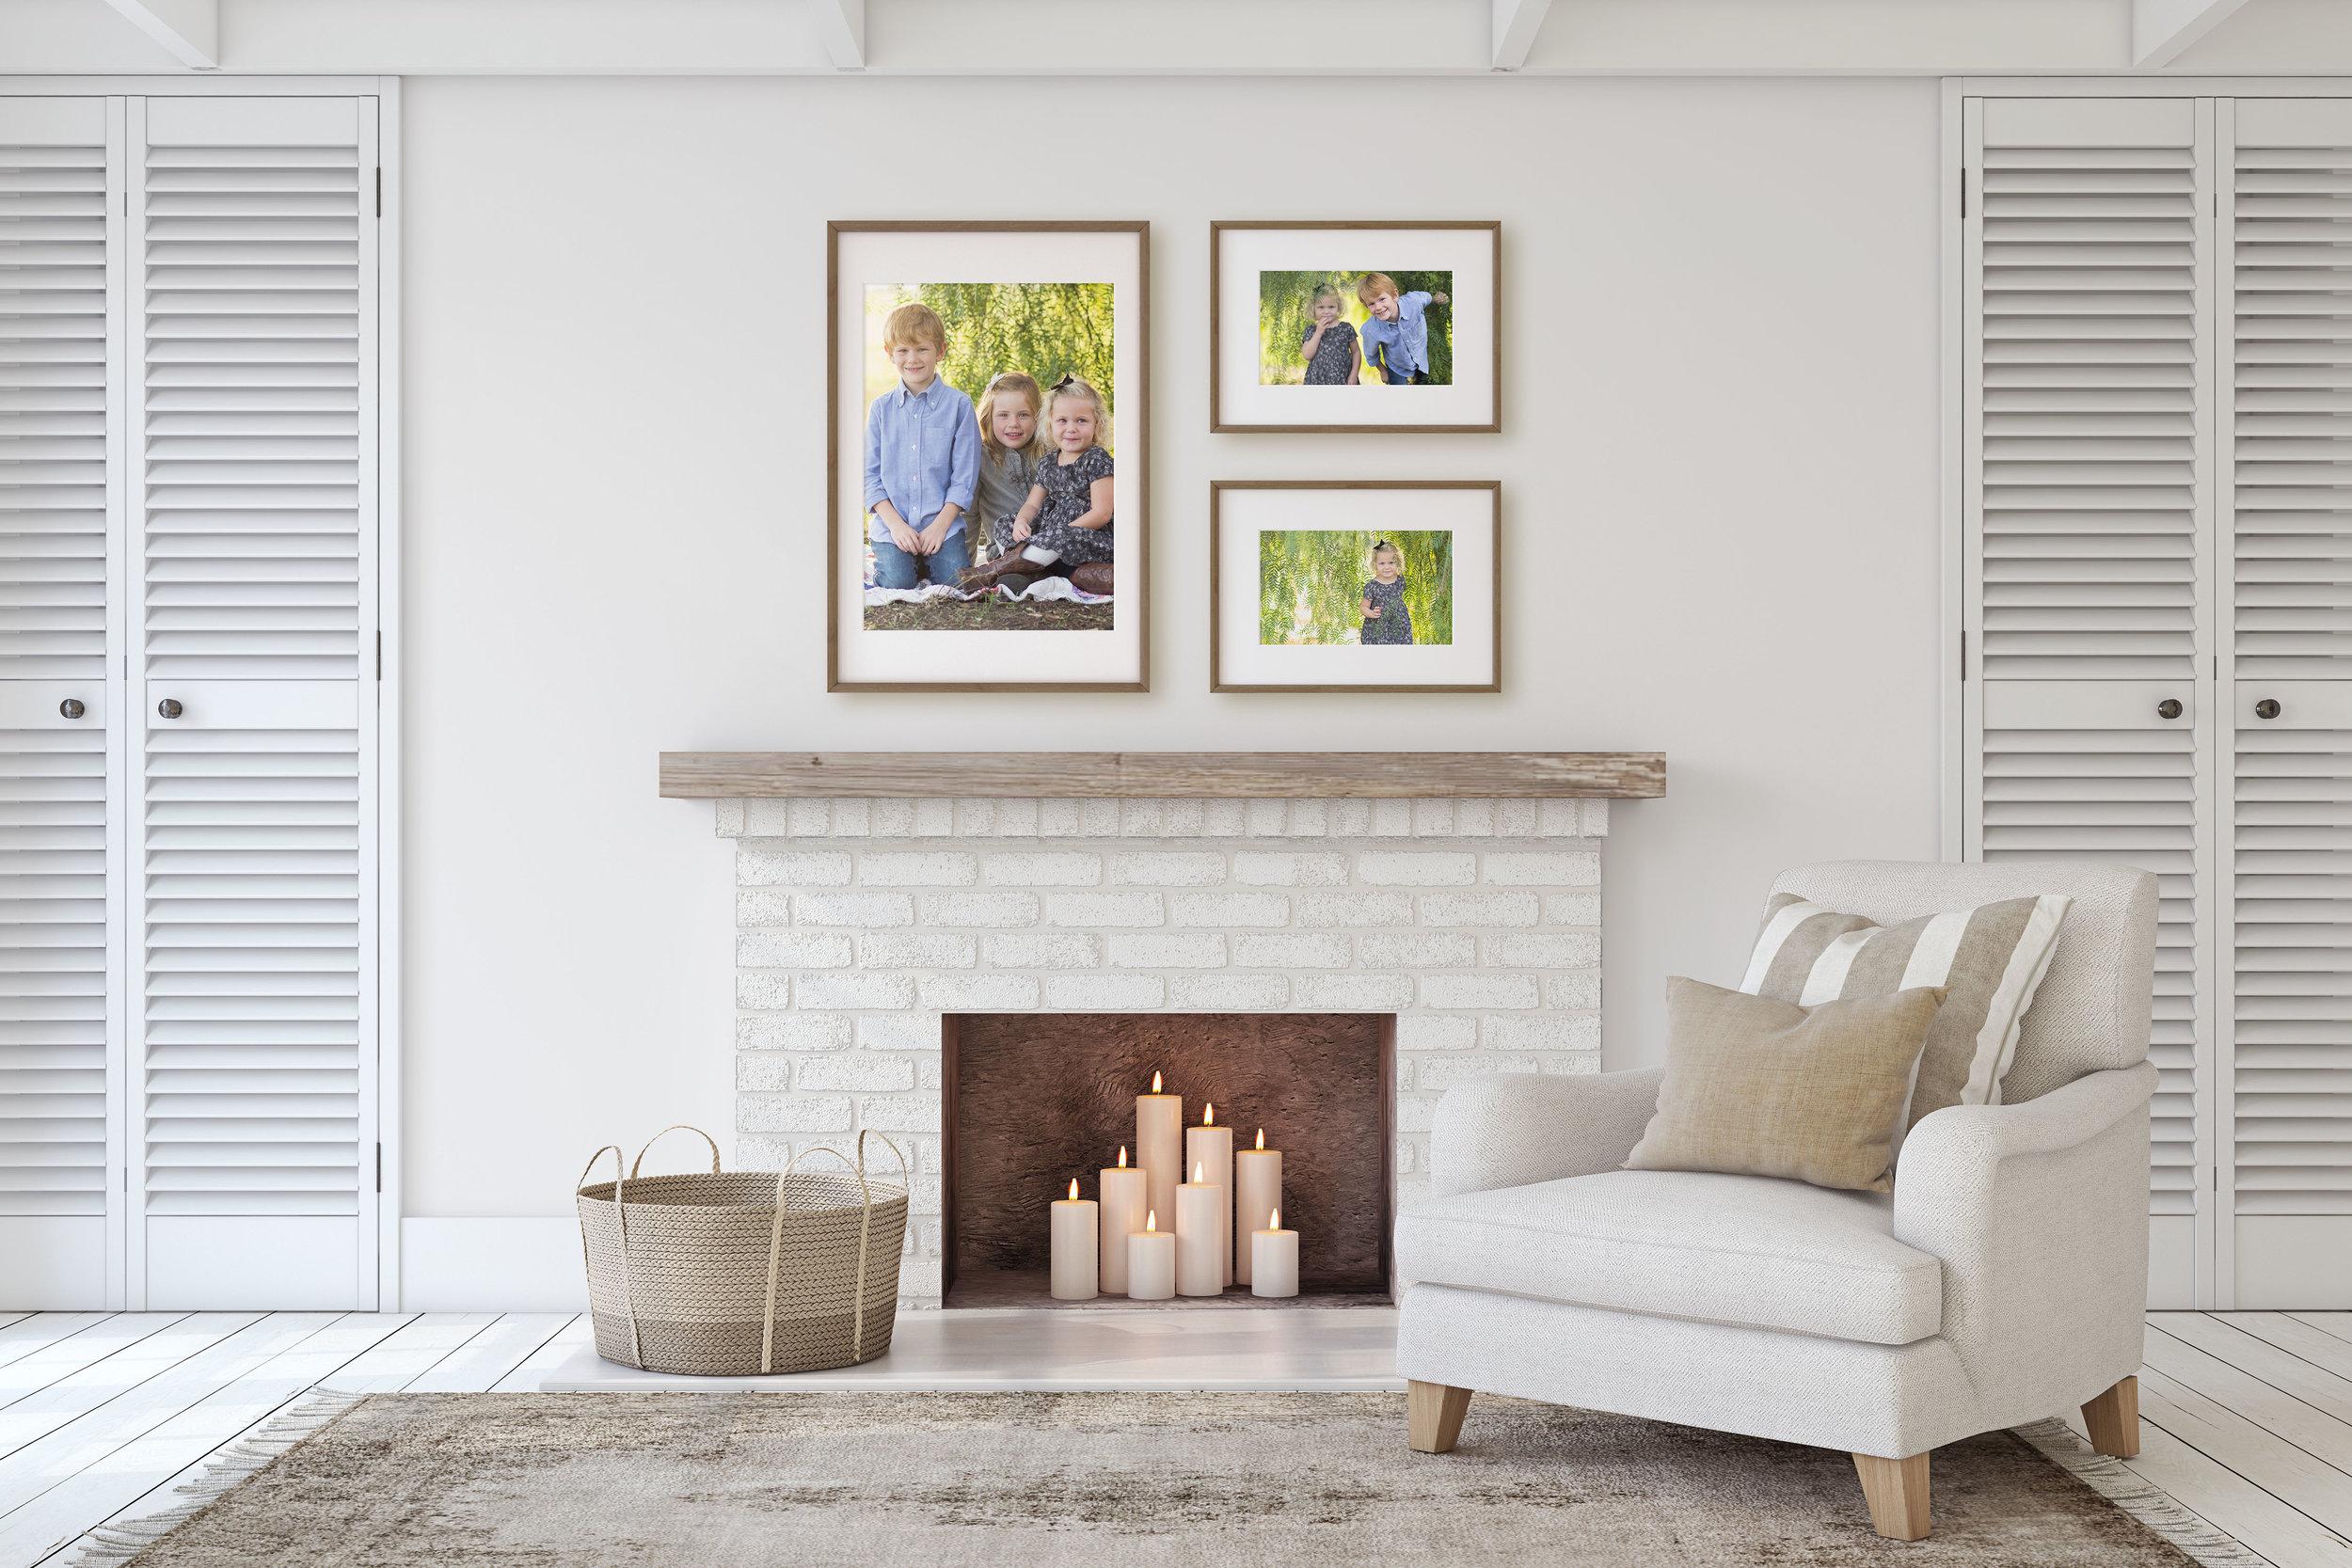 Fireplace-Habbestad.jpg